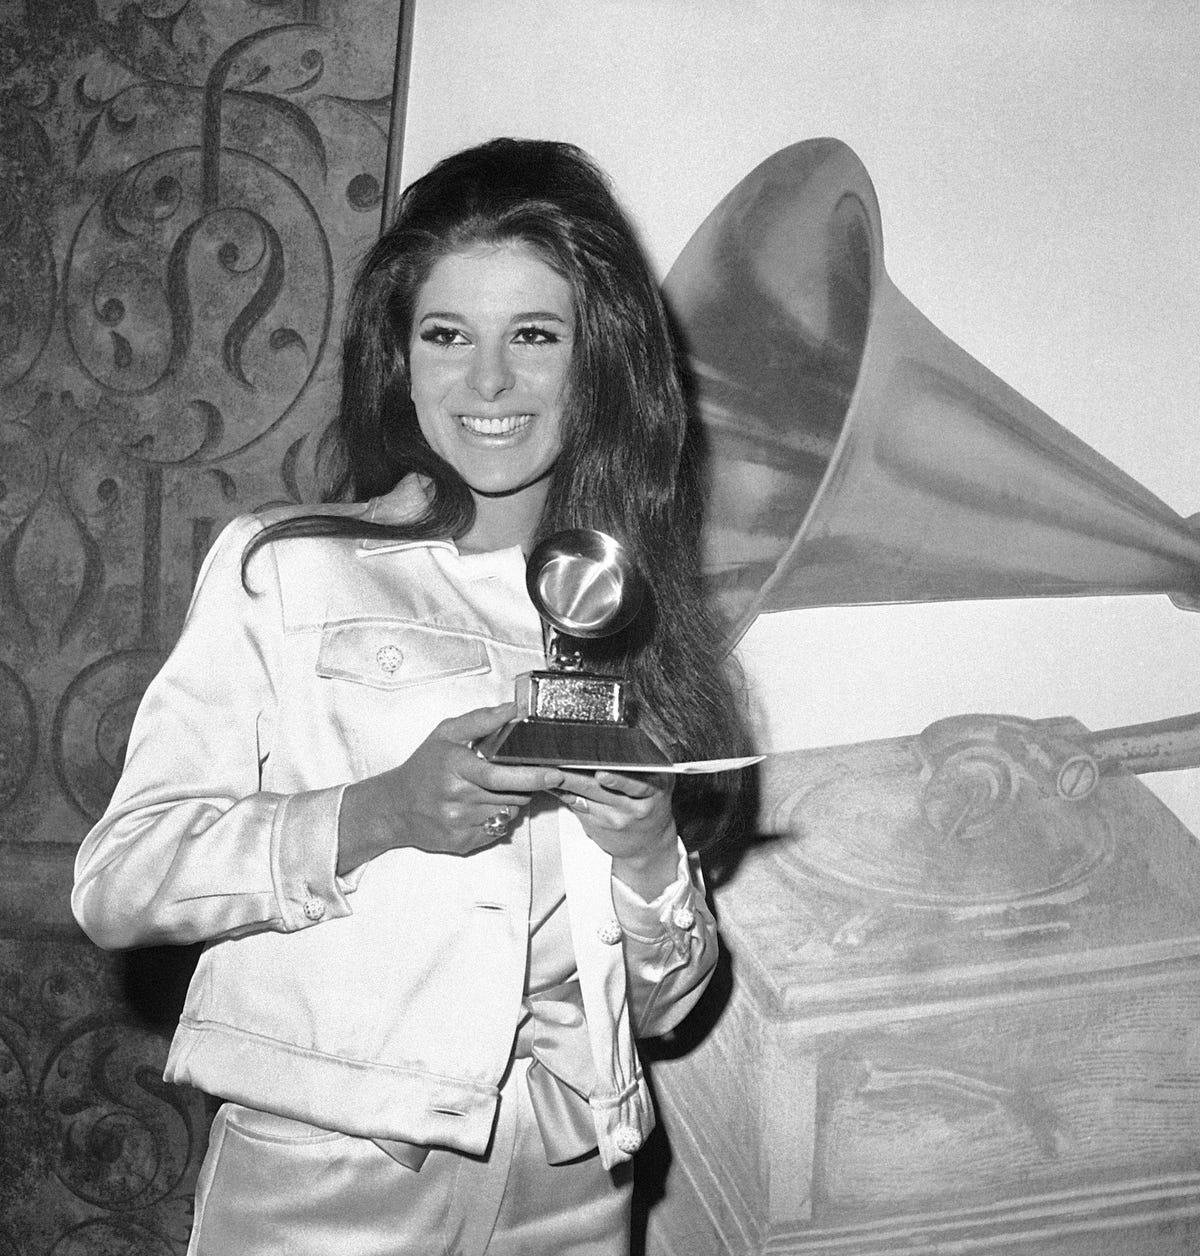 Watkins: What happened to singer Bobbie Gentry?